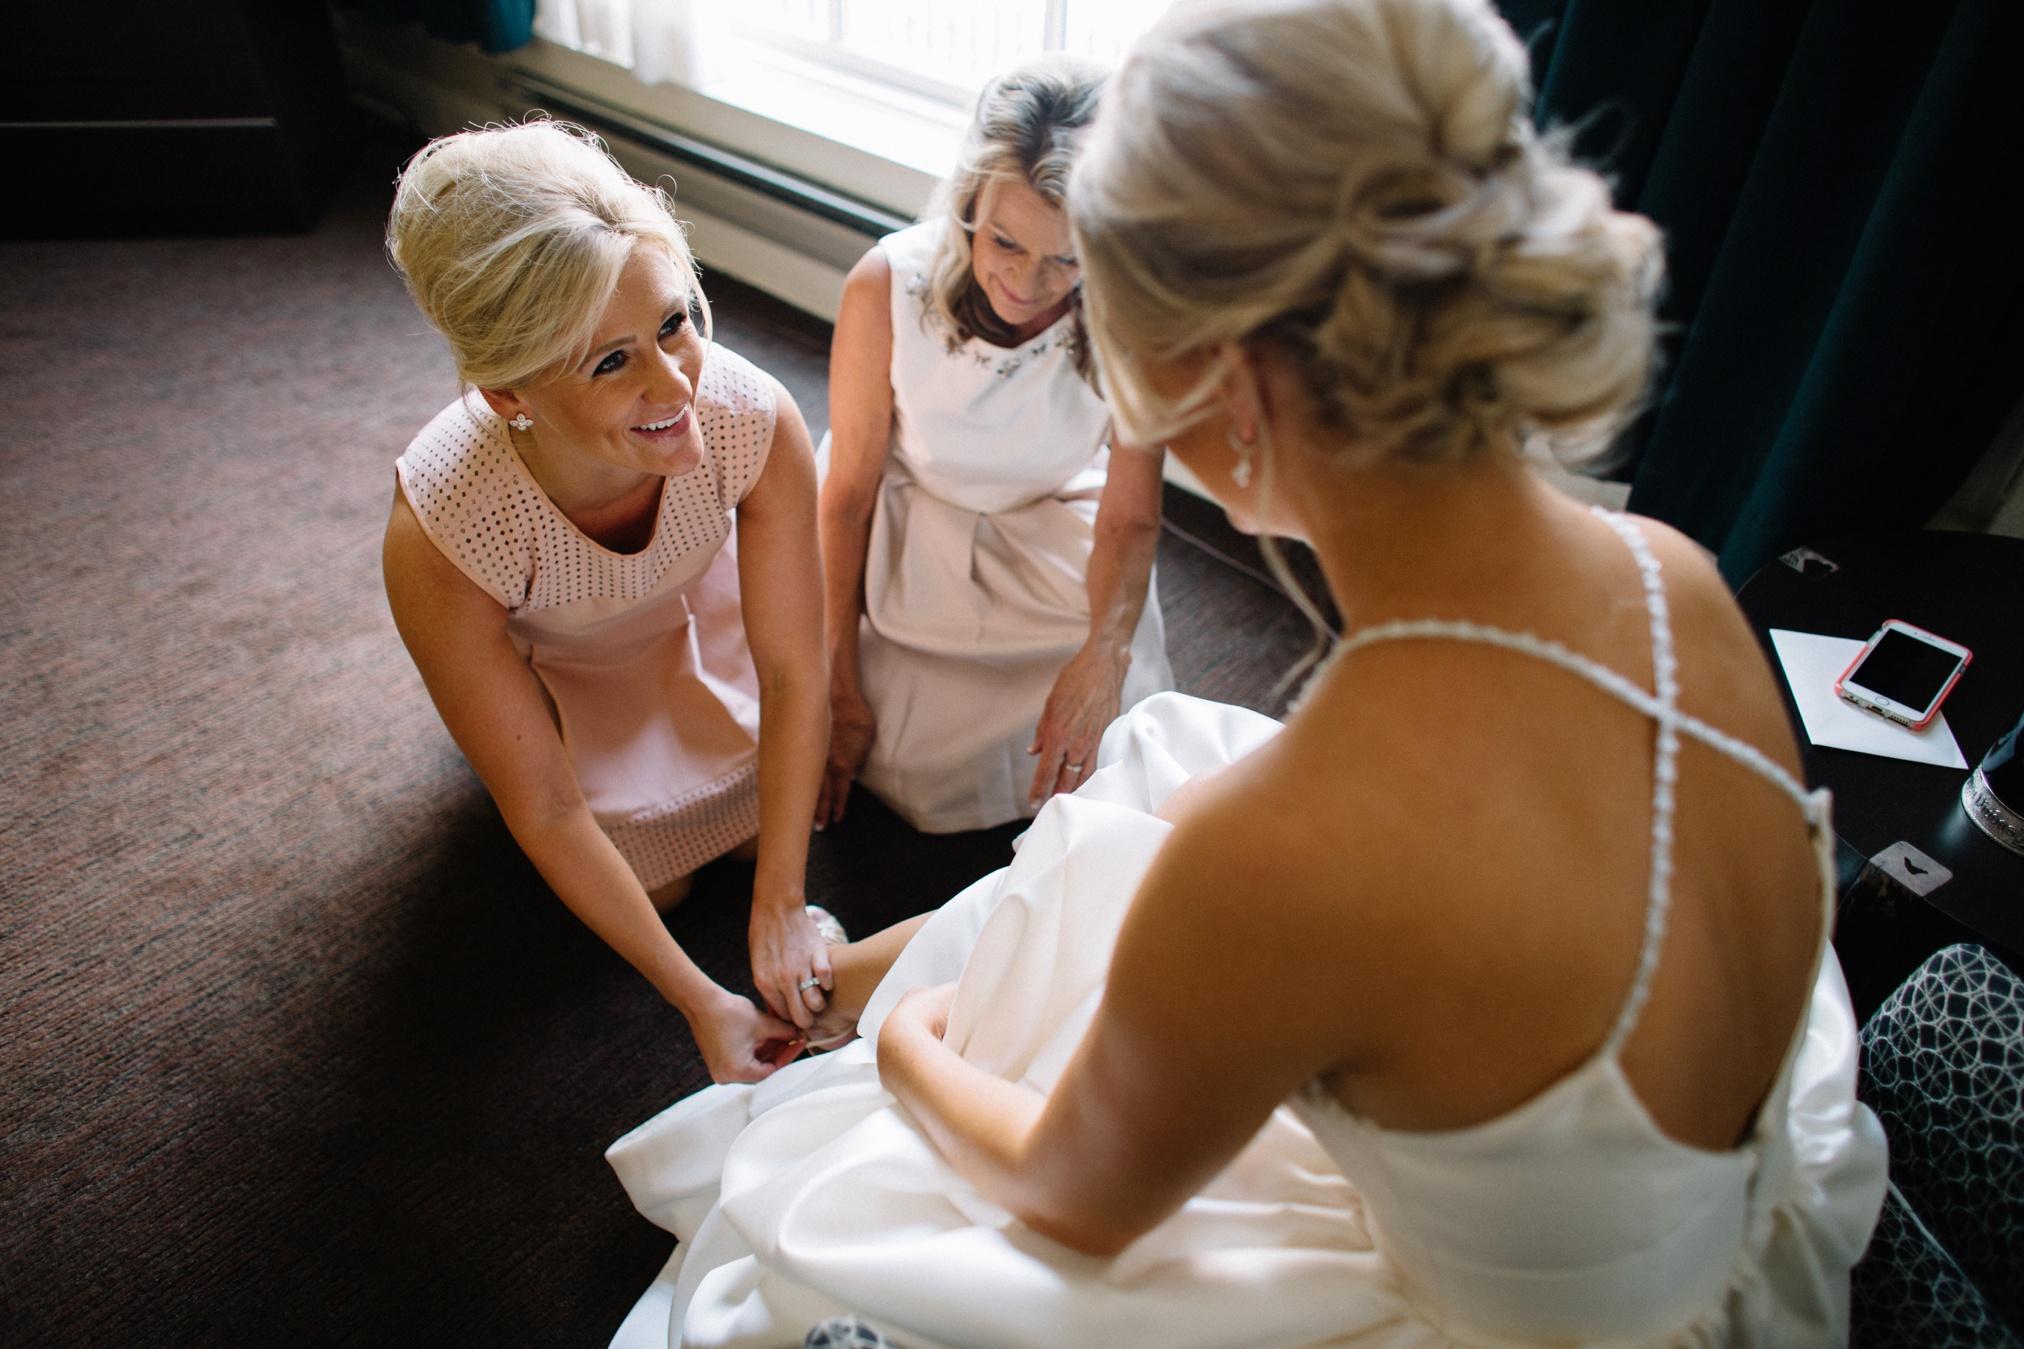 brenna+michael_wedding-78.jpg